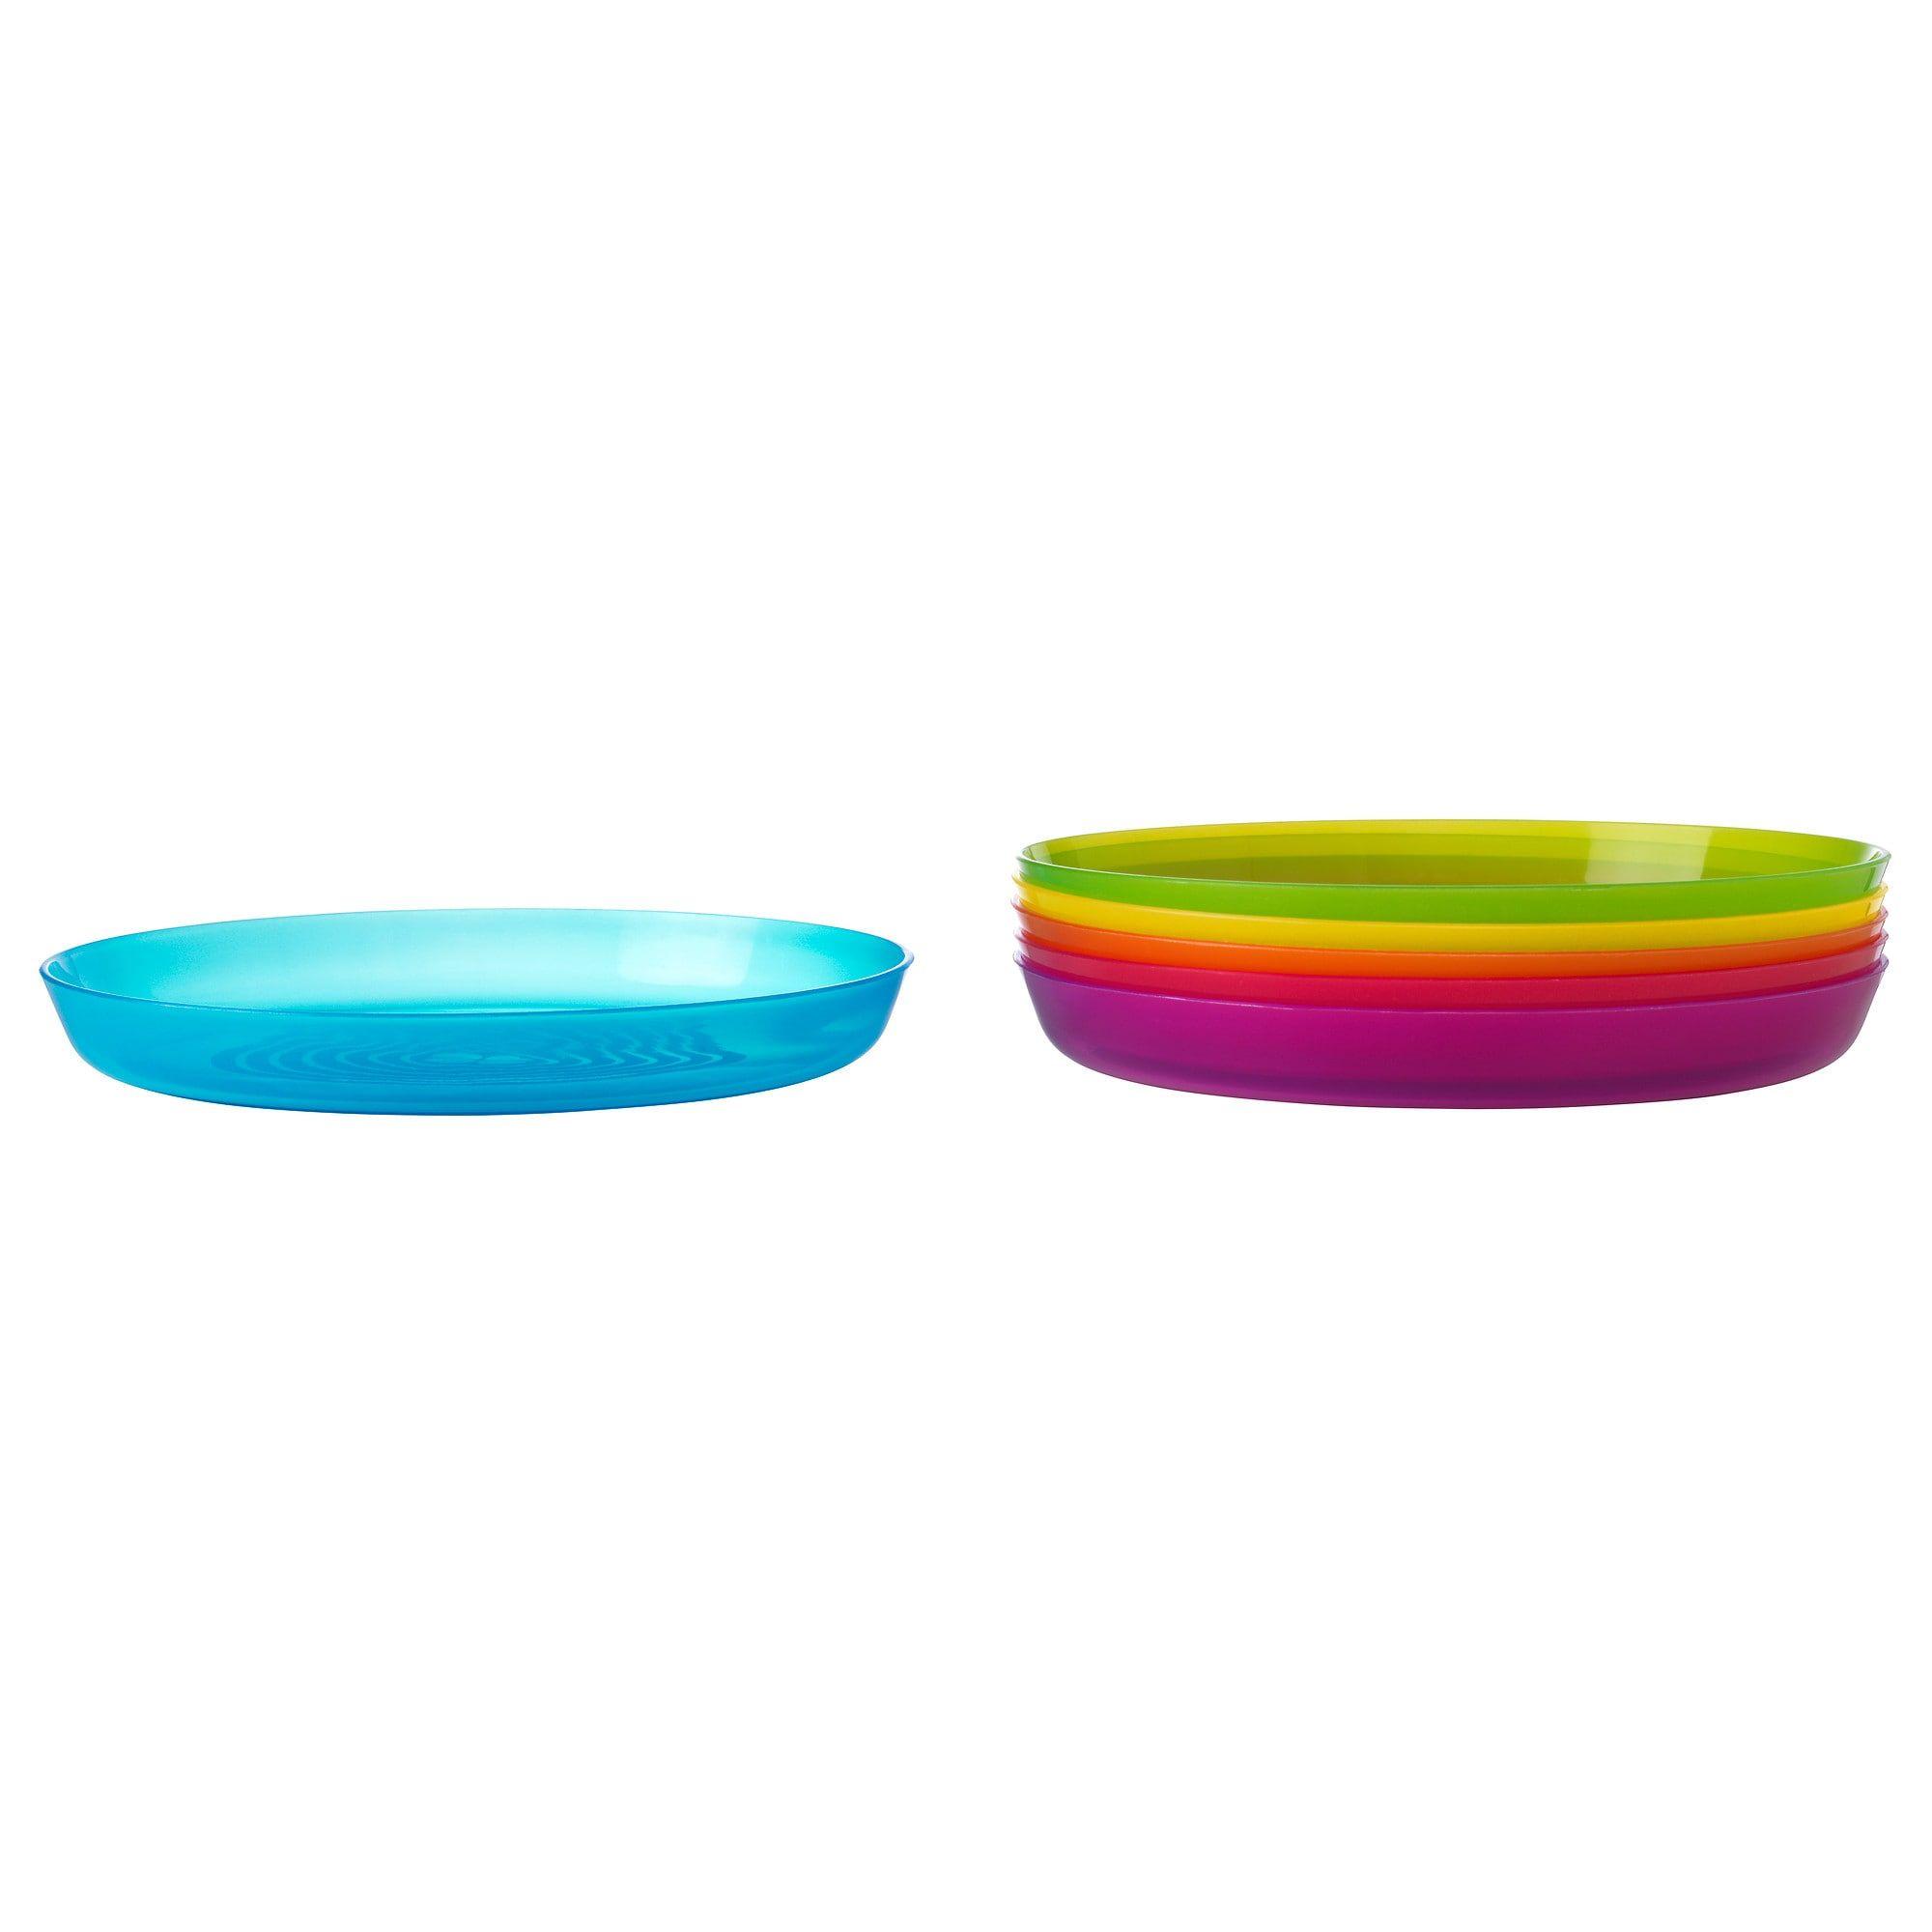 Us Furniture And Home Furnishings Plastic Plates Kids Plates Plastic Cutlery